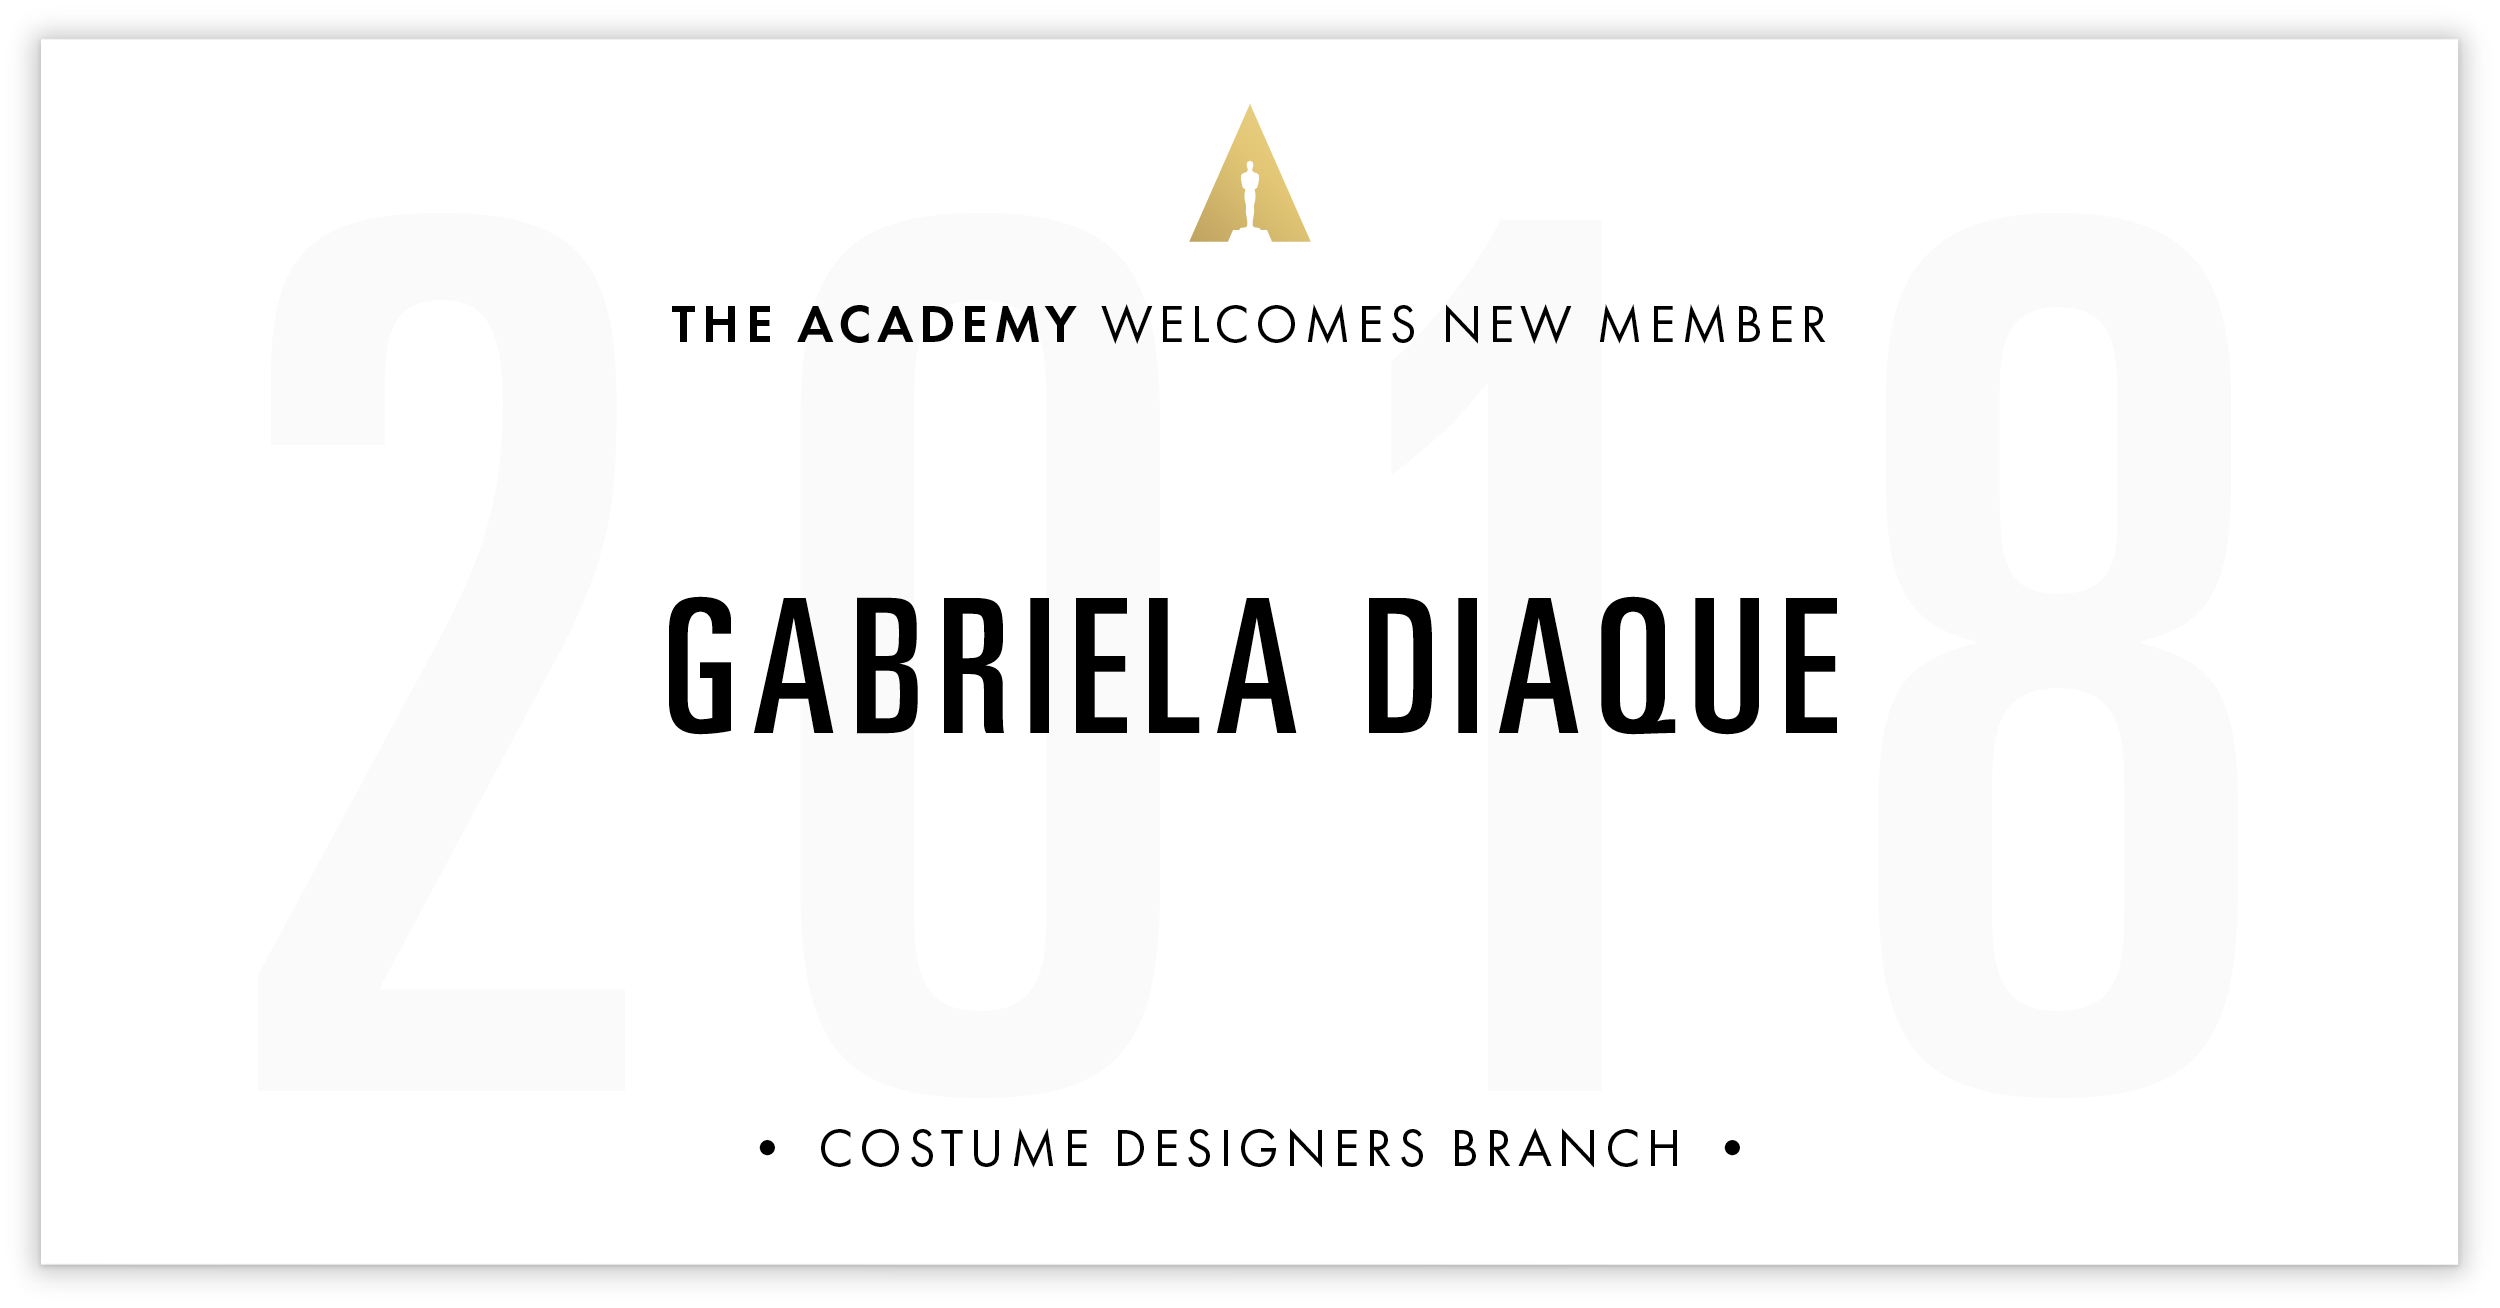 Gabriela Diaque is invited!